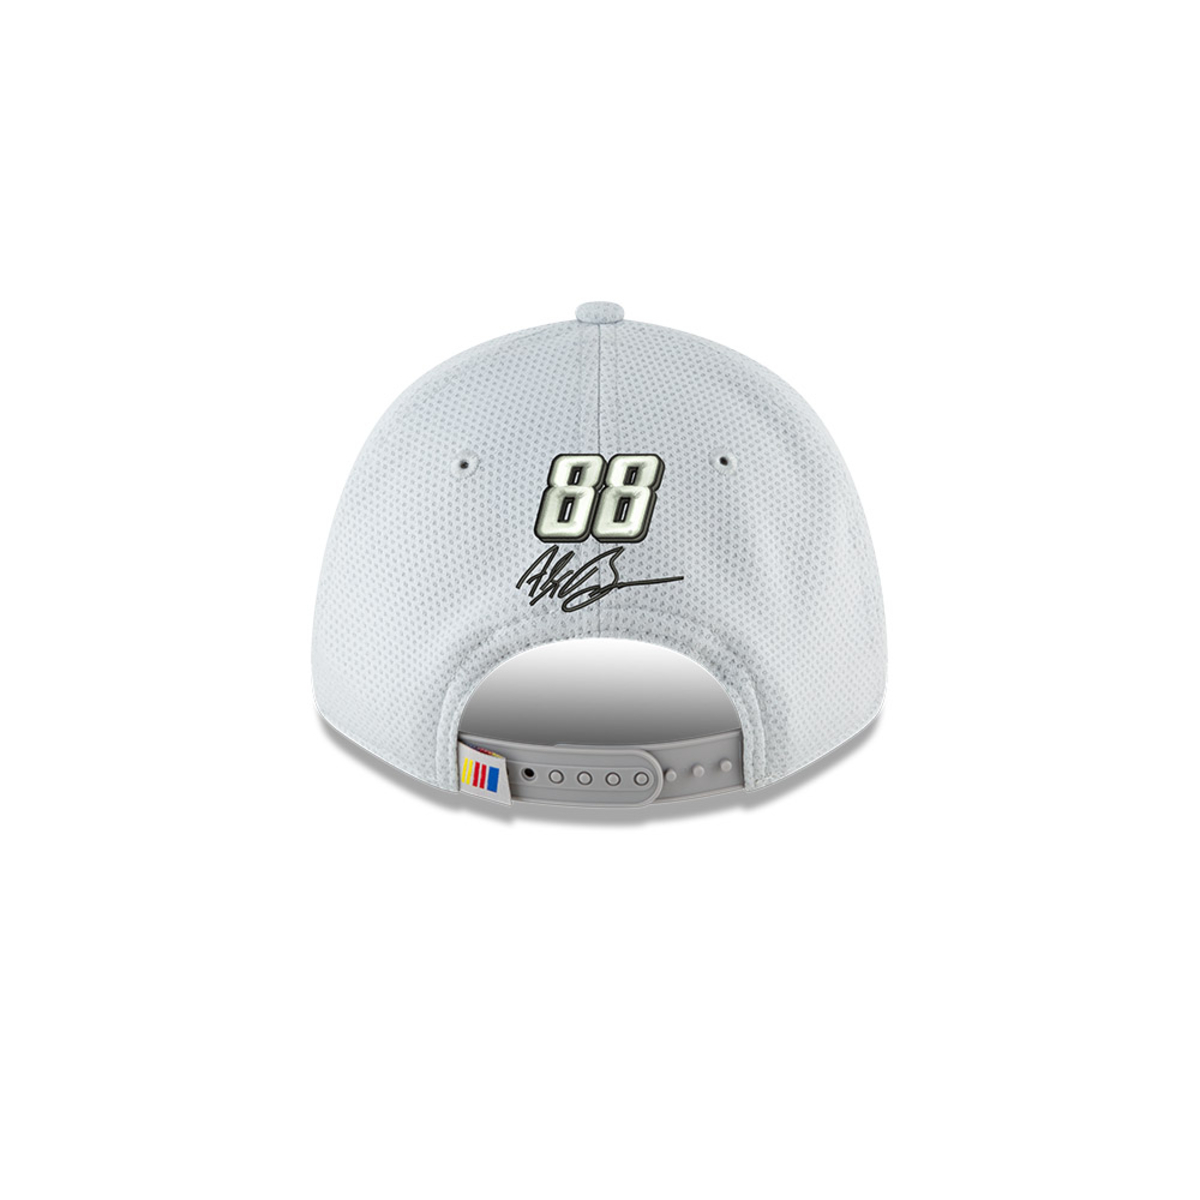 BYRON 2020 PLAYOFFS LIBERTY NASCAR CUP HAT